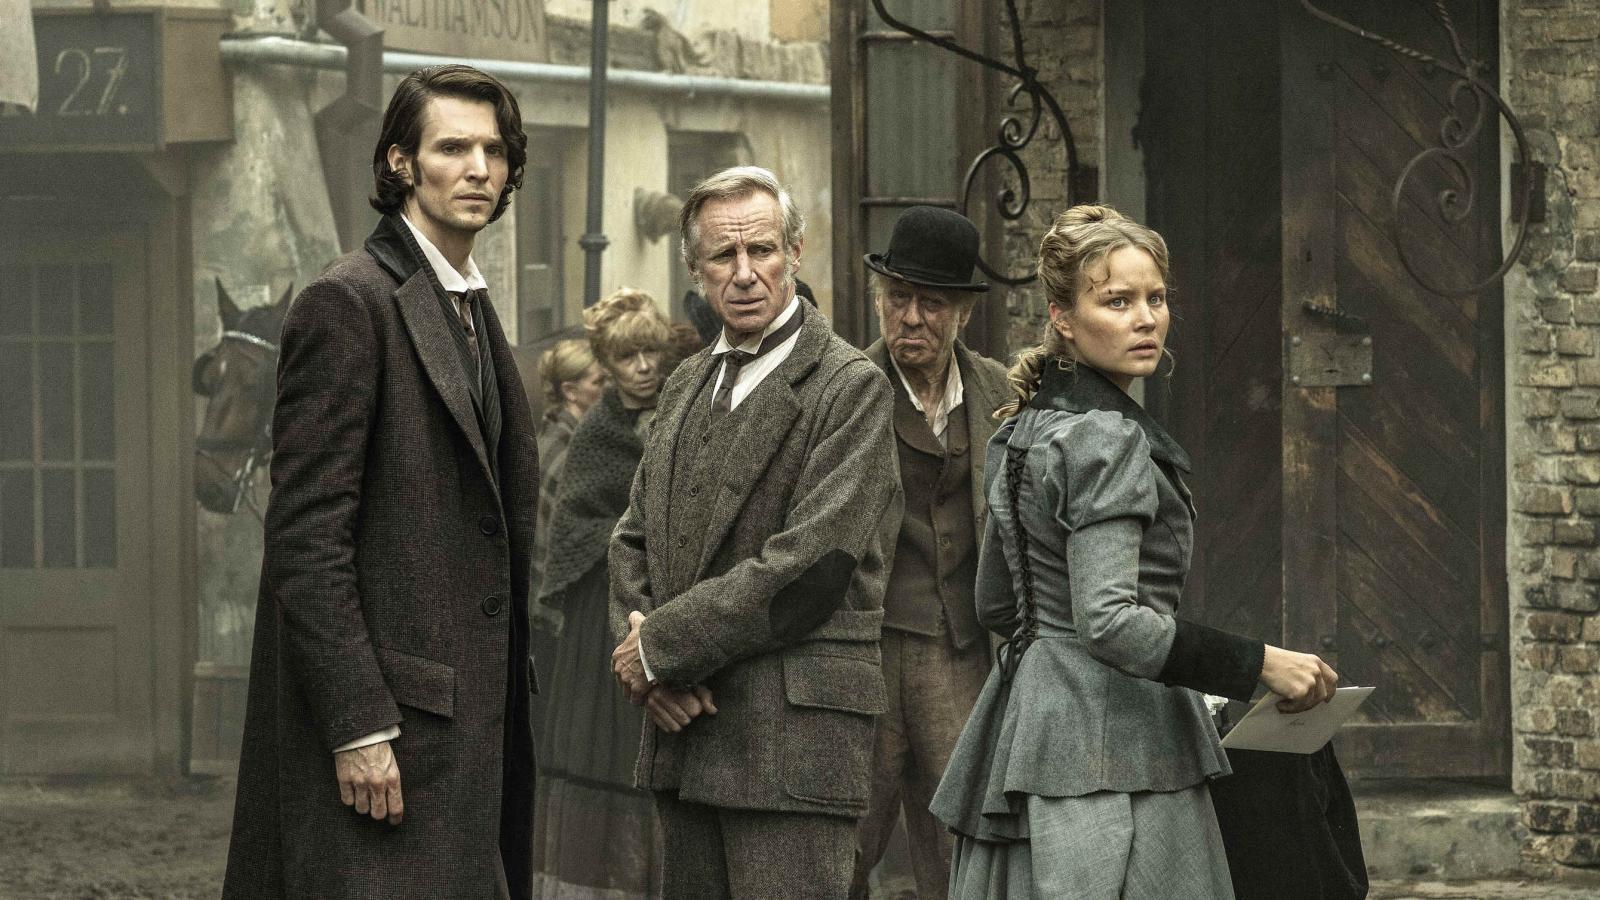 David Cohen (Sabin Tambrea), Samuel Harris (Nicholas Farrell) and Anna Kosminski (Sonja Gerhardt) in Jack the Ripper (2016)